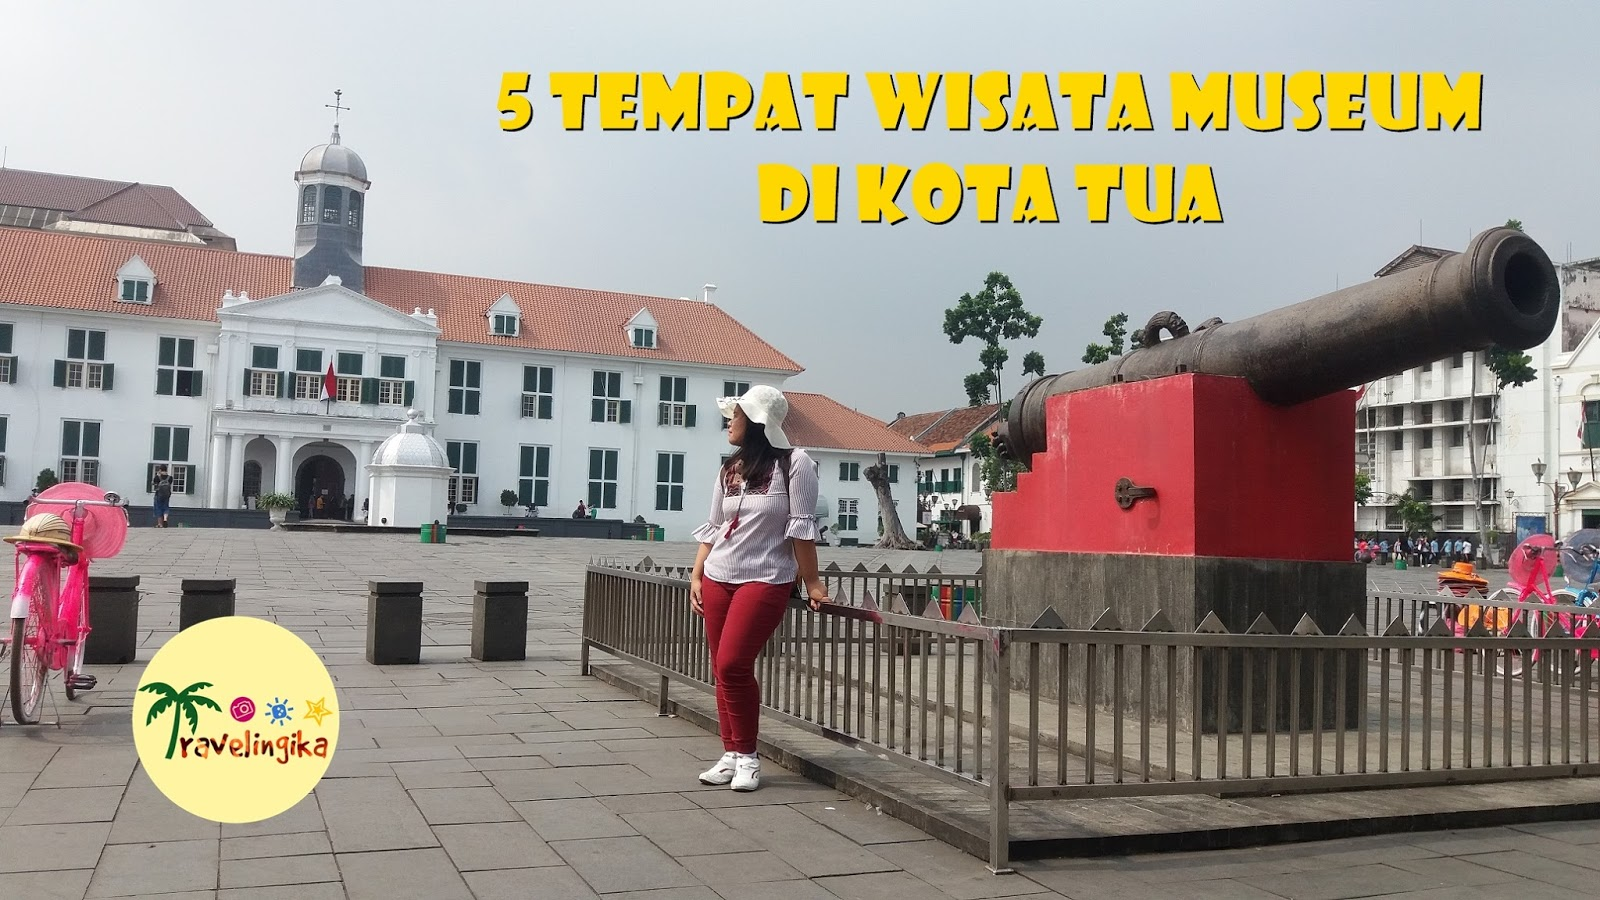 5 Tempat Wisata Museum Kota Tua Jakarta Travelingika Target Ngetrip